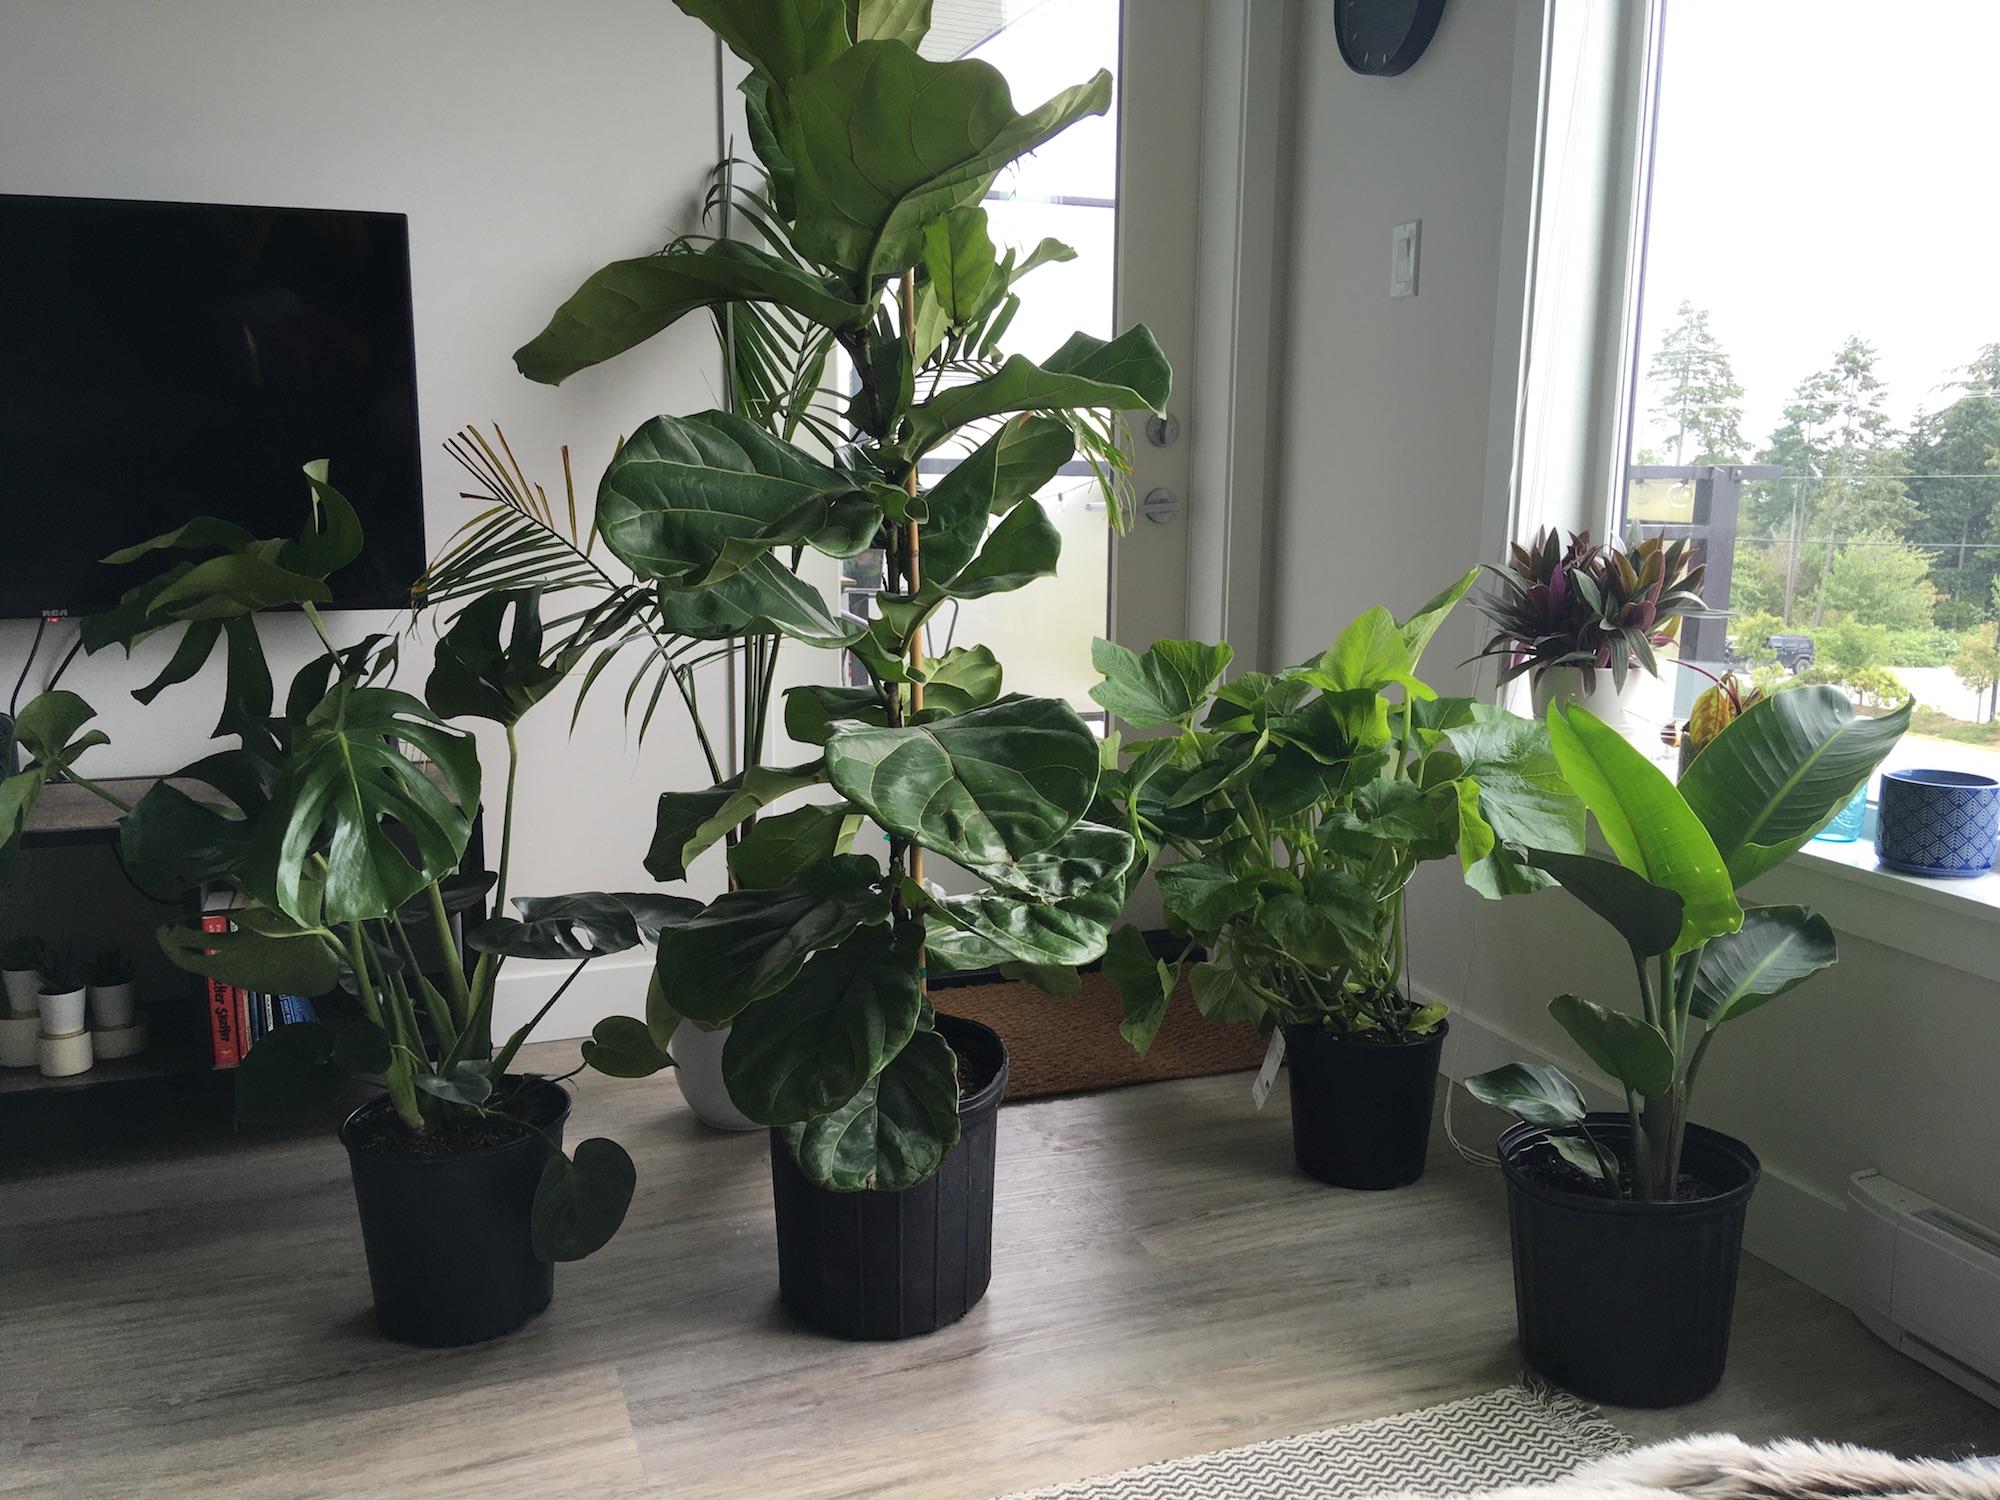 Generic Van Life - End of Van Life - Houseplants